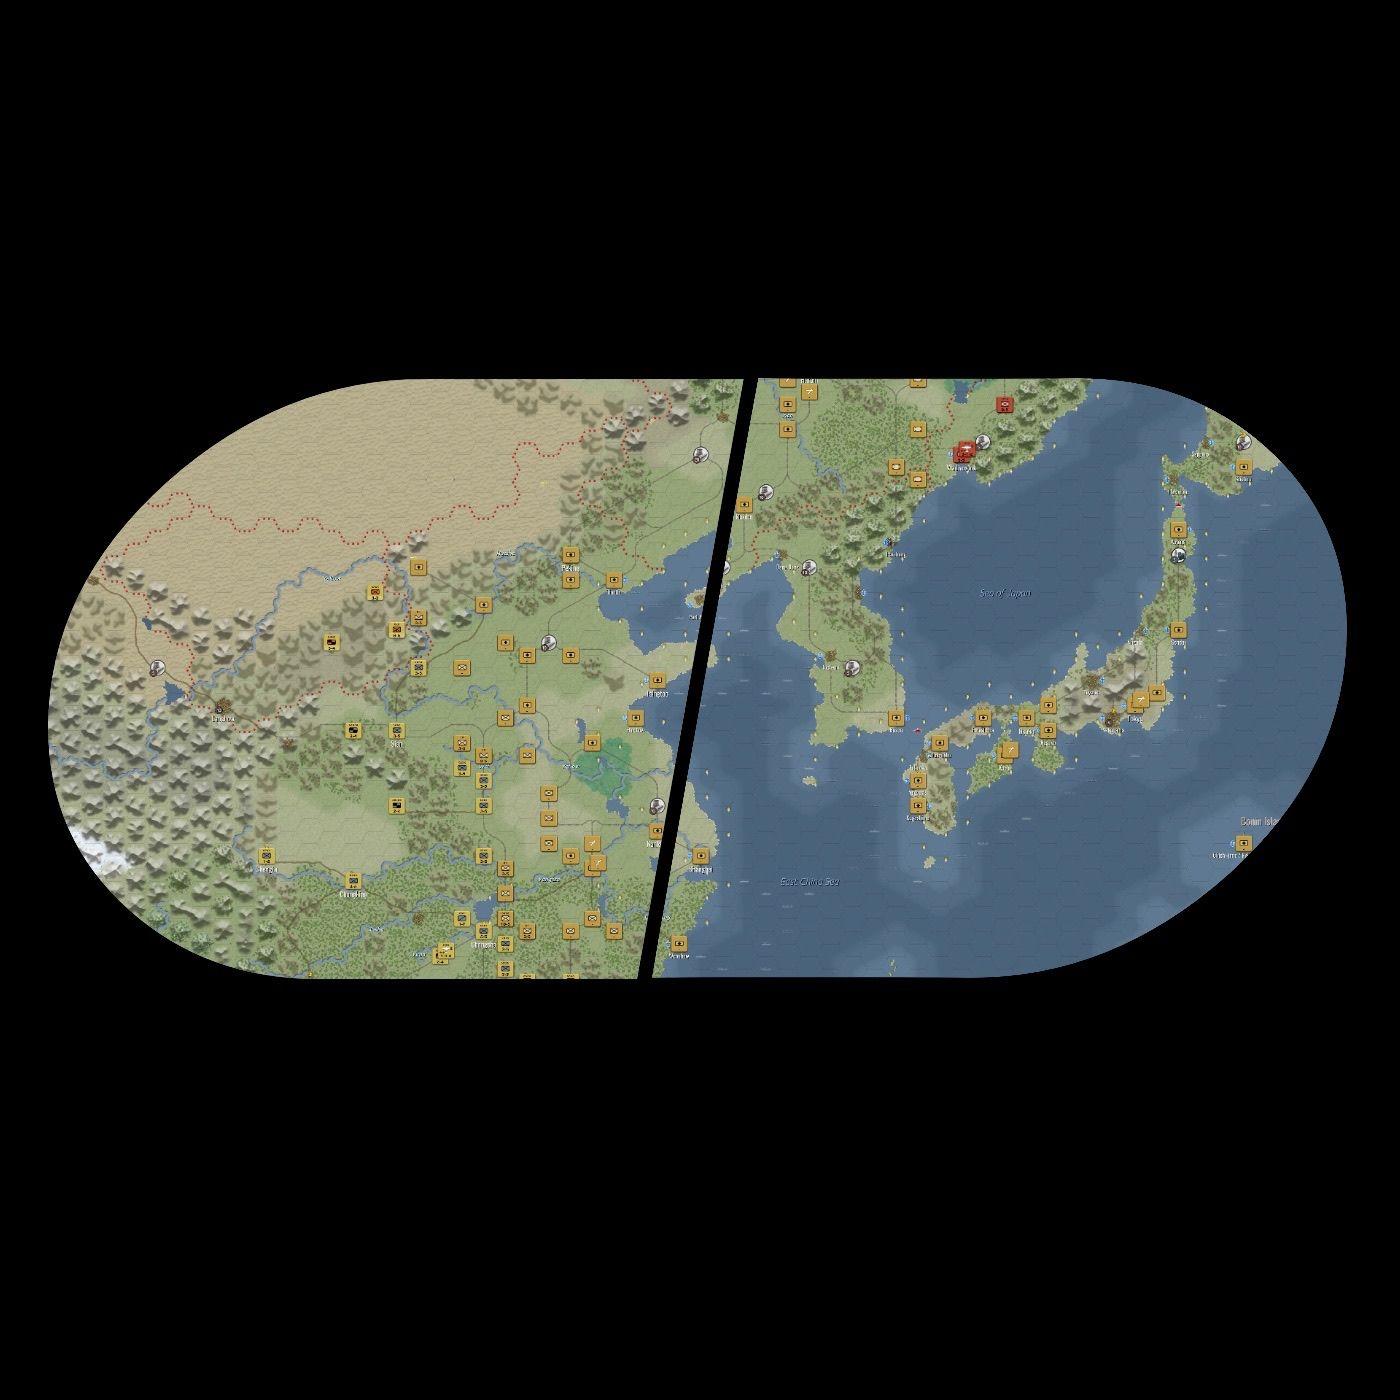 16: WarPlan Pacific - The Perfect Hybrid Between Casual & Grognard Gaming Feat Alvaro Sousa